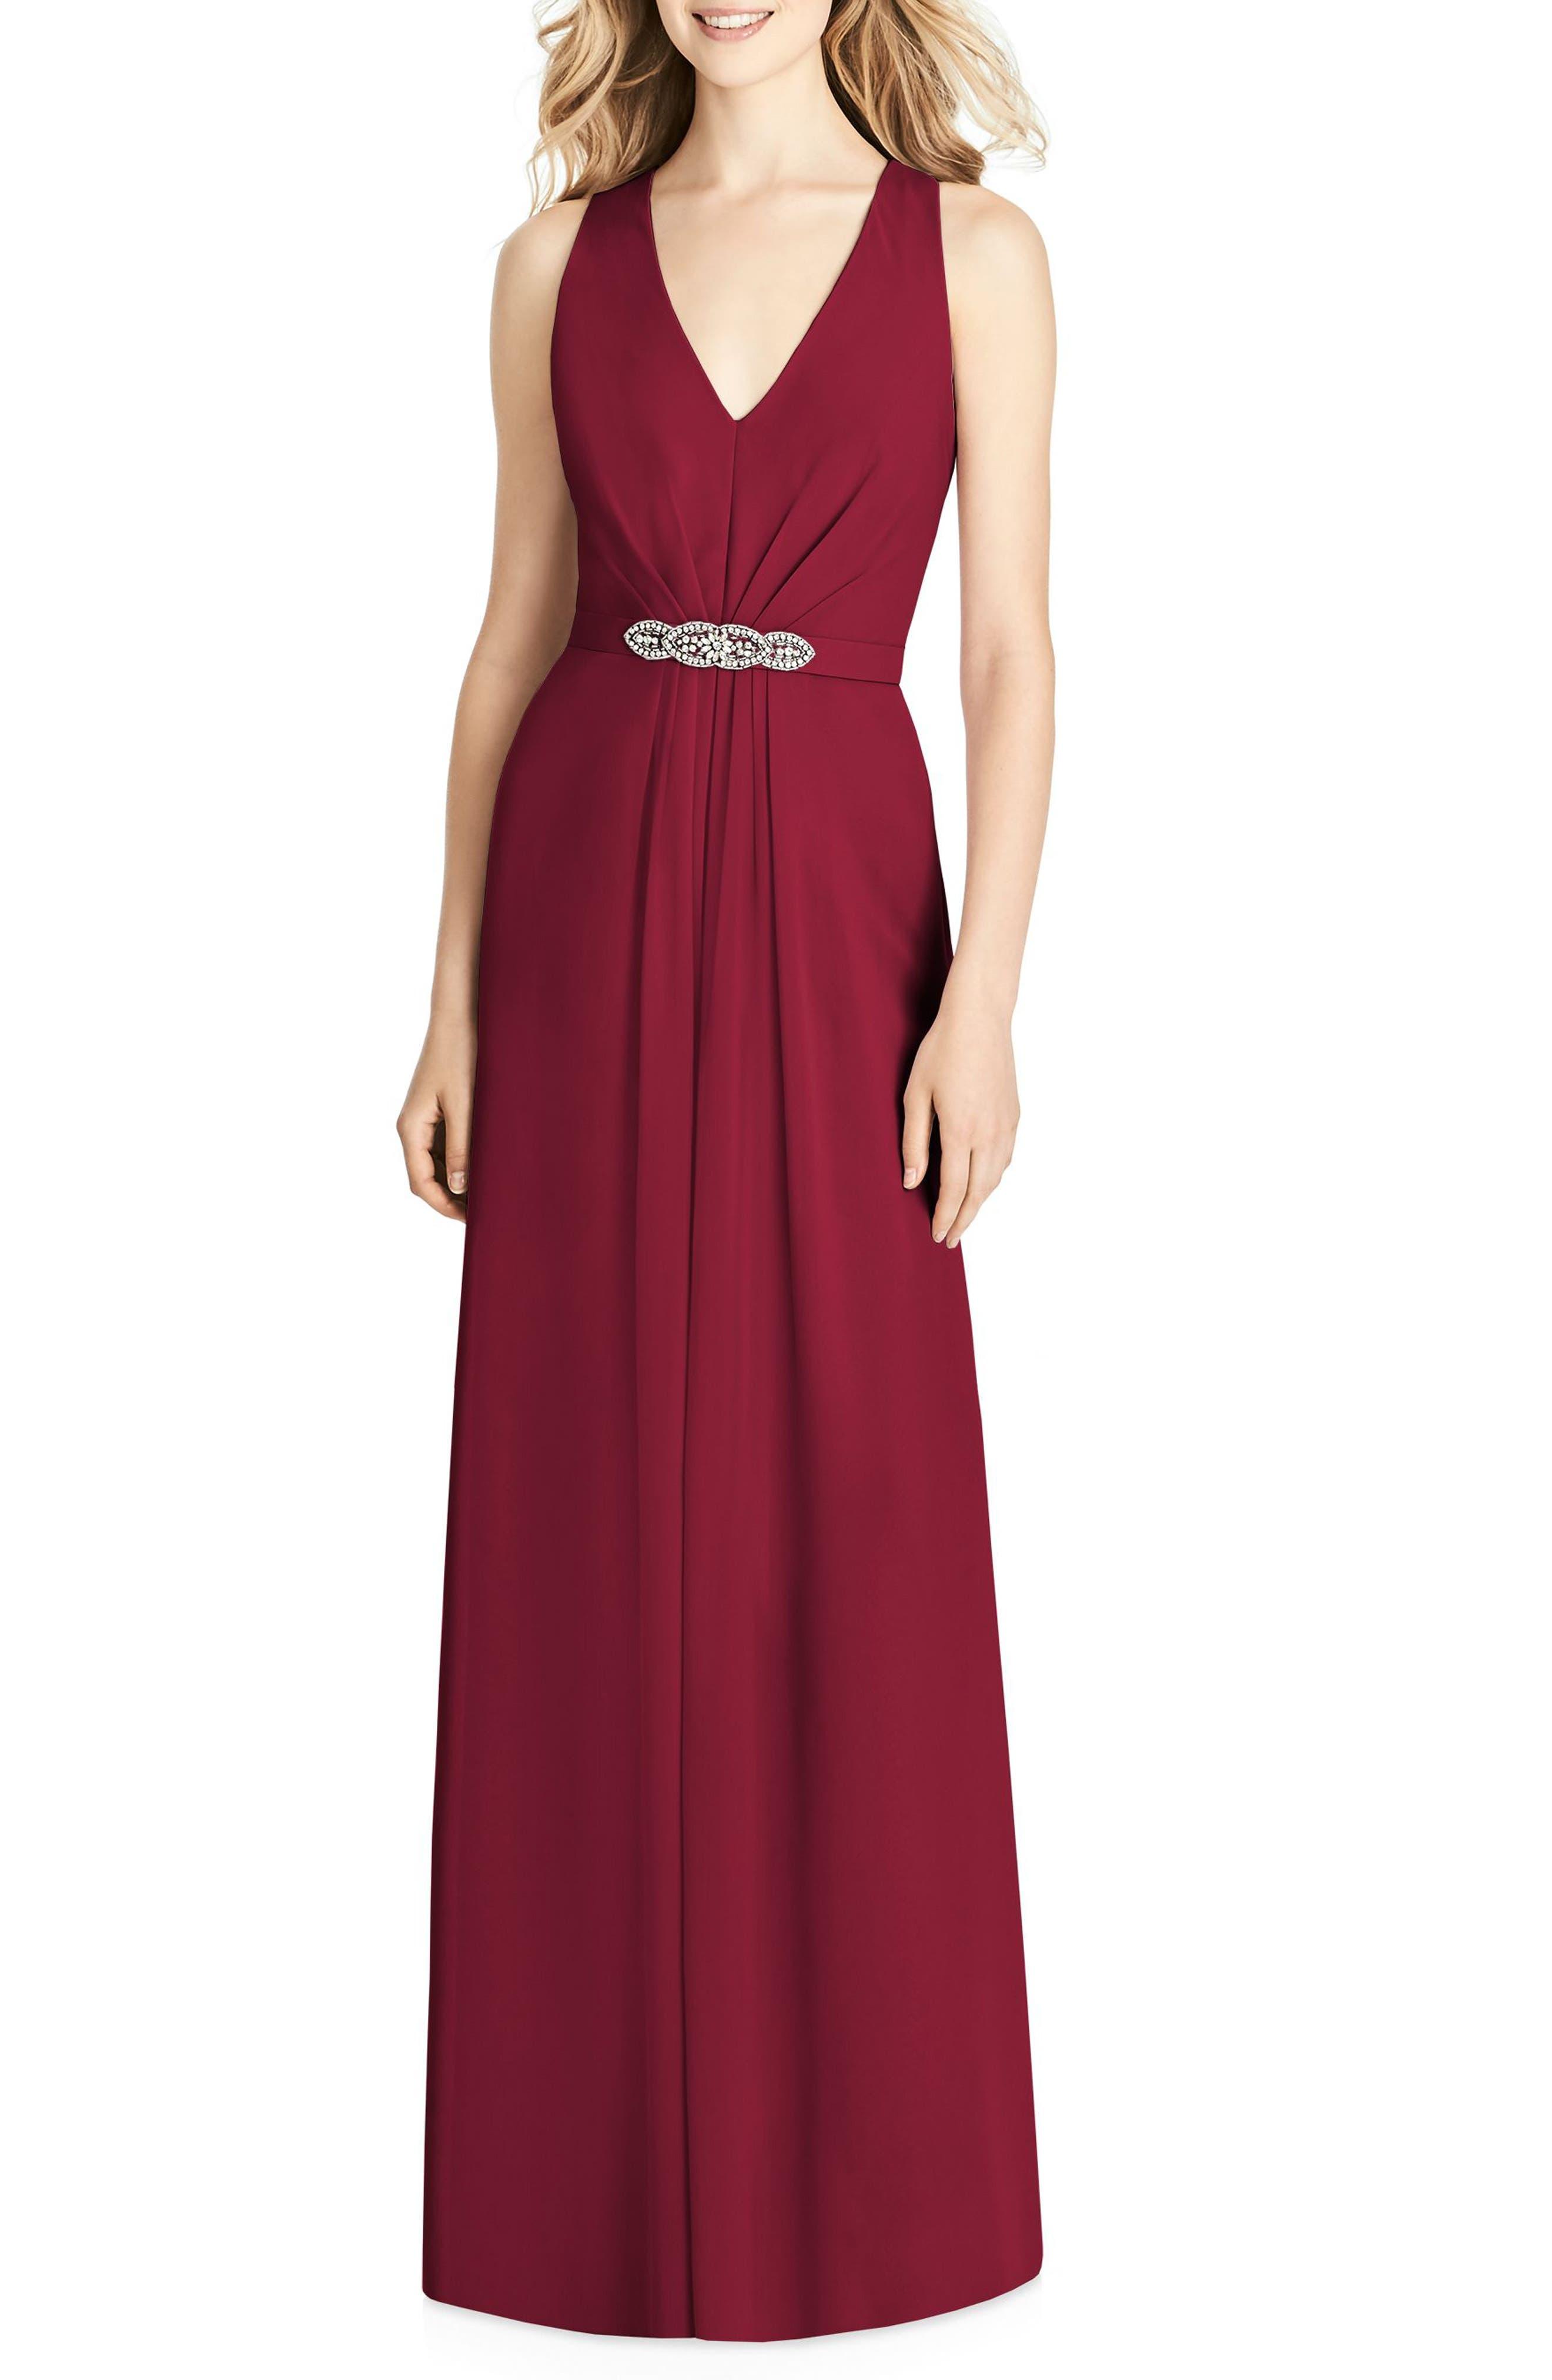 Jenny Packham Jewel Belt Chiffon Gown, Burgundy